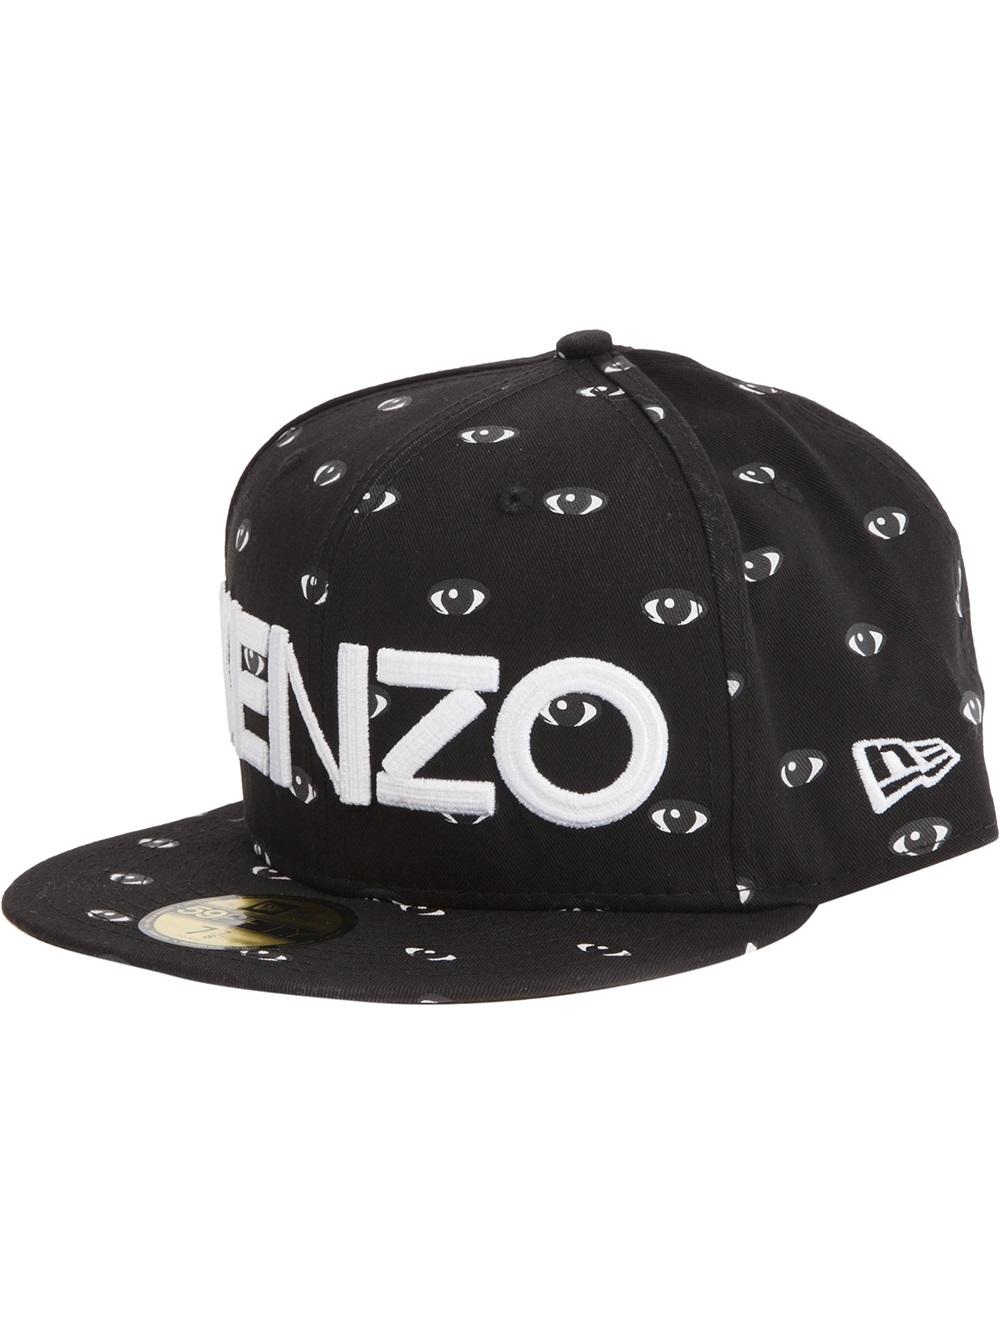 3977e128a4e Lyst - KENZO Eye Print Logo Cap in Black for Men